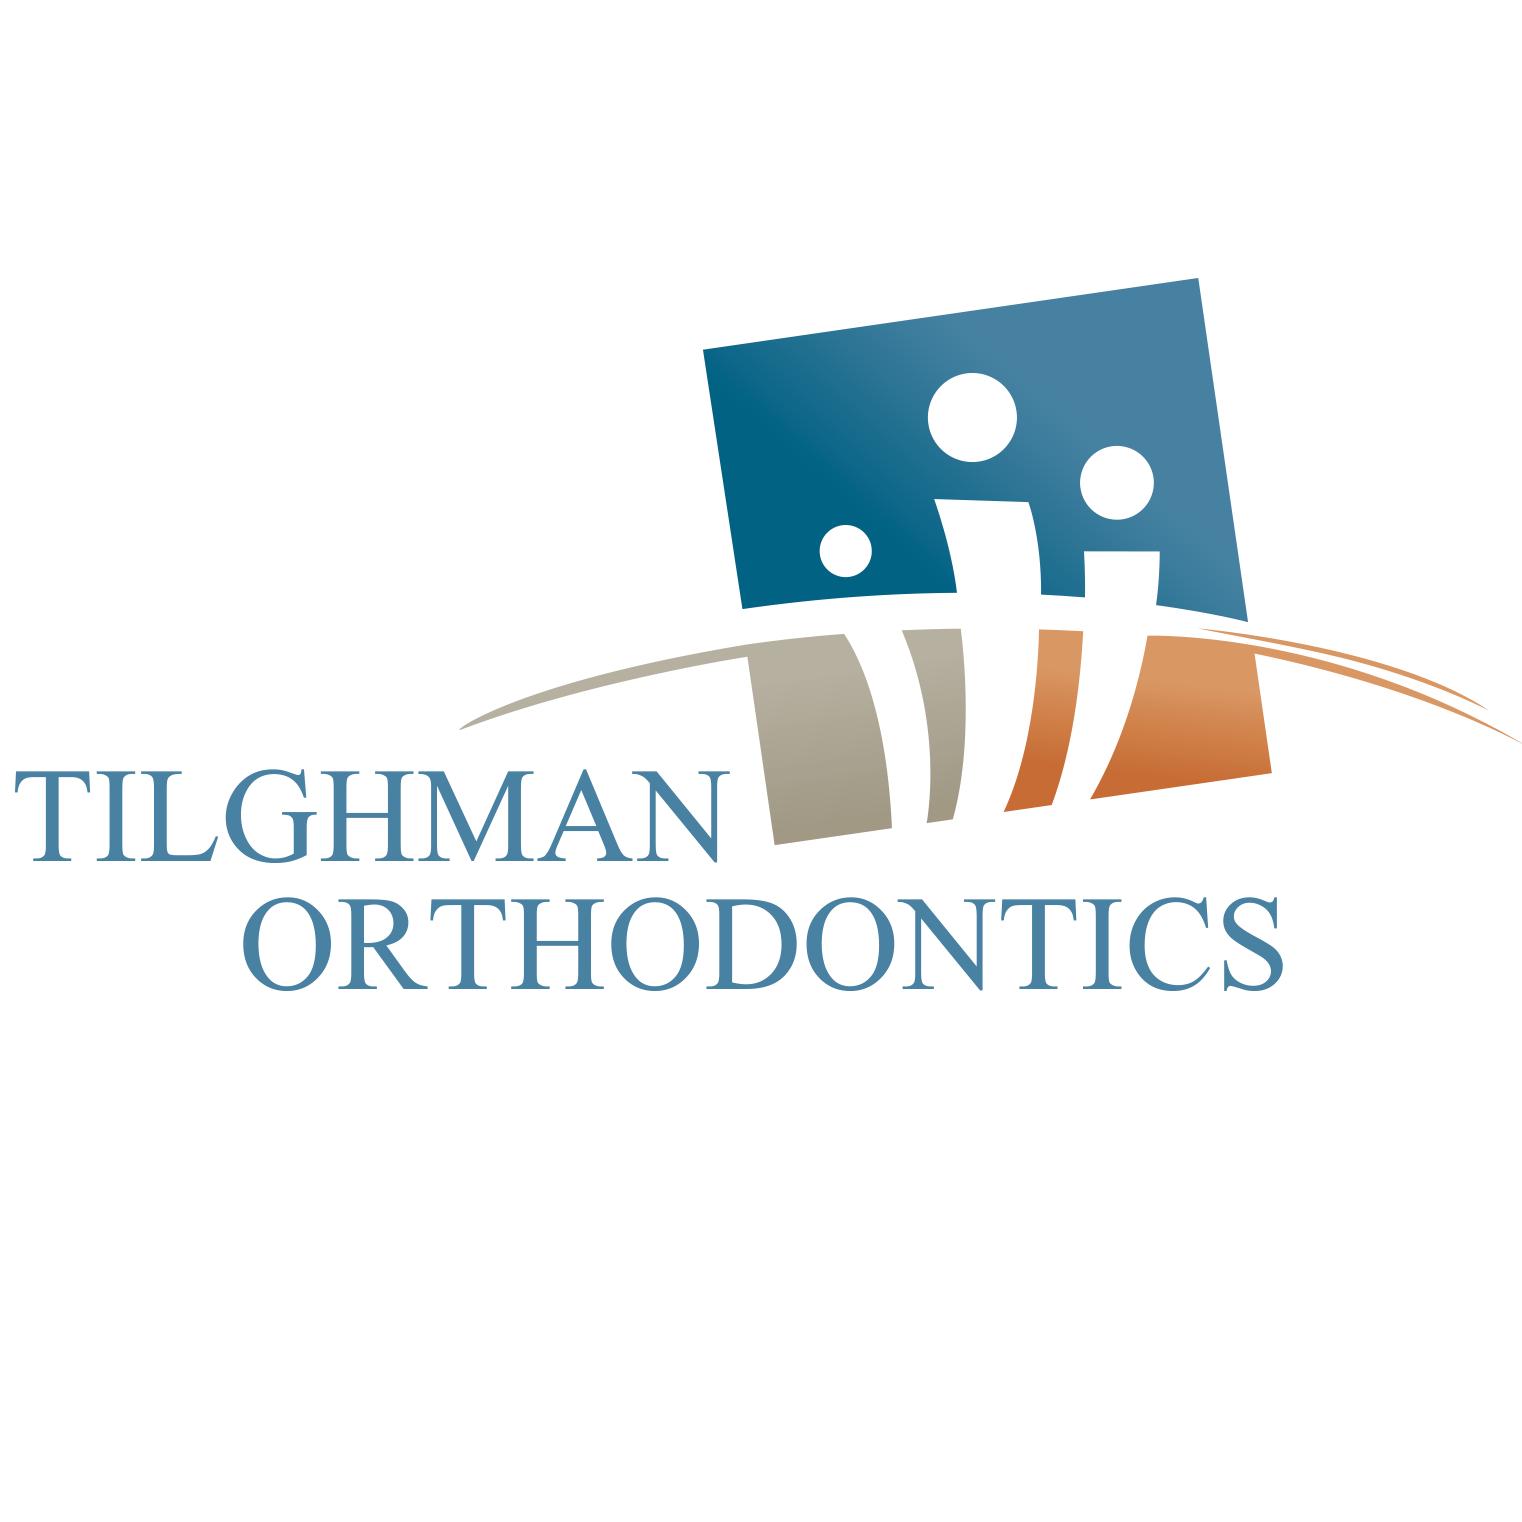 Tilghman Orthodontics - Salisbury, MD 21804 - (410)742-4813 | ShowMeLocal.com